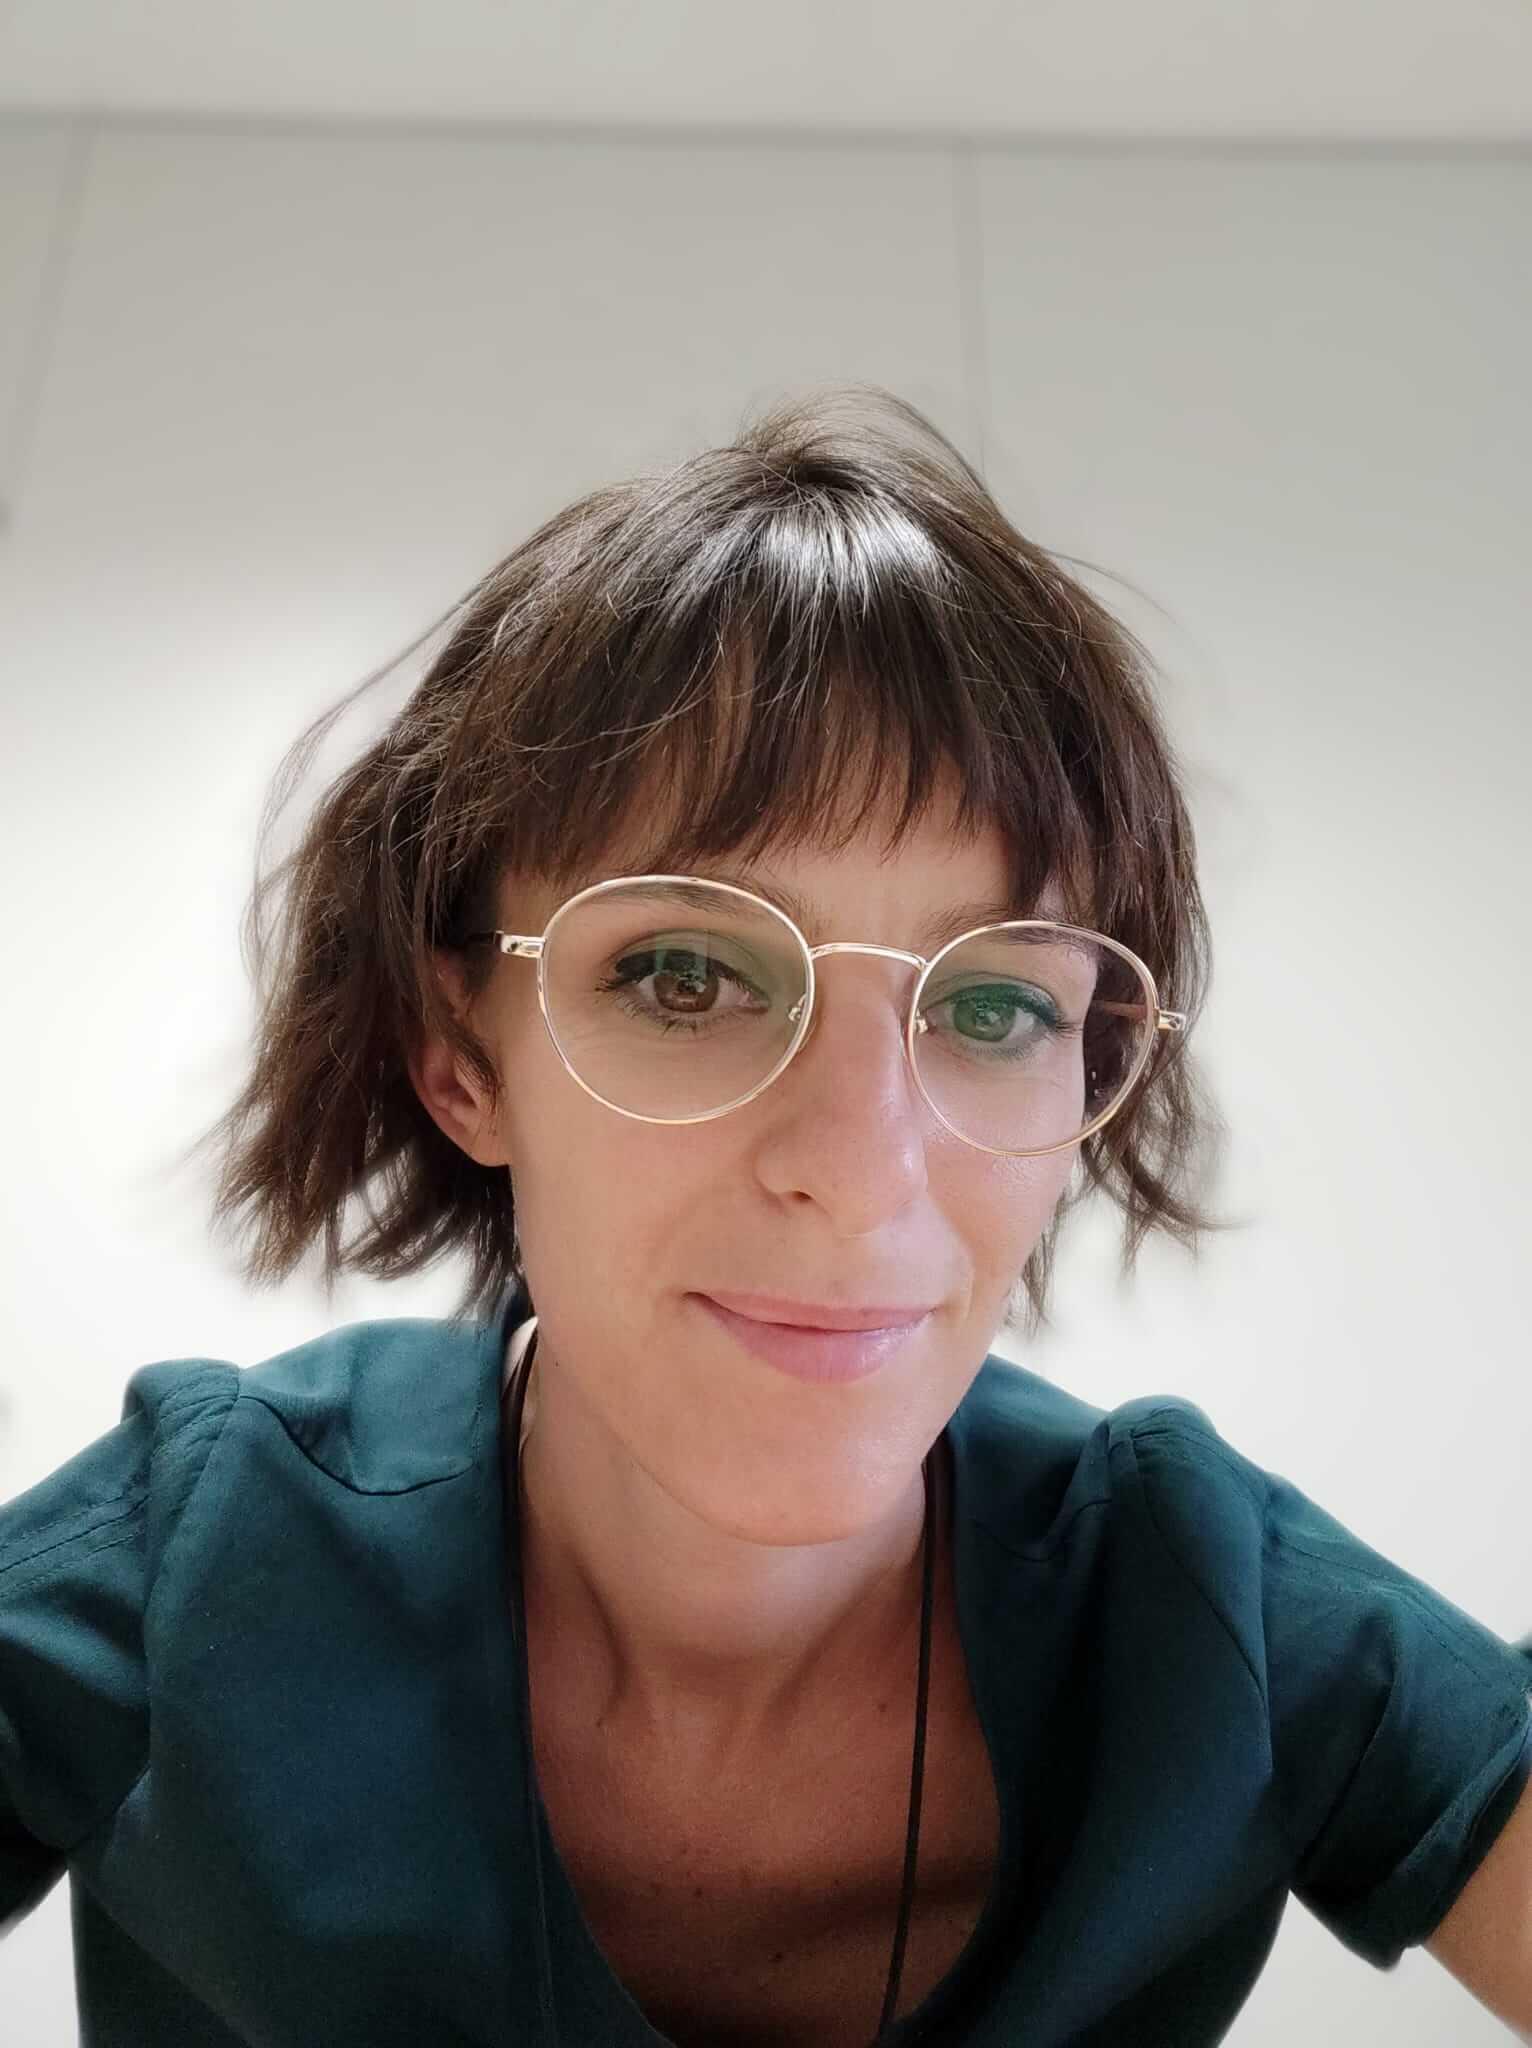 https://www.studicognitivi.it/wp-content/uploads/2018/02/FerrariCristina.jpeg - Studi Cognitivi